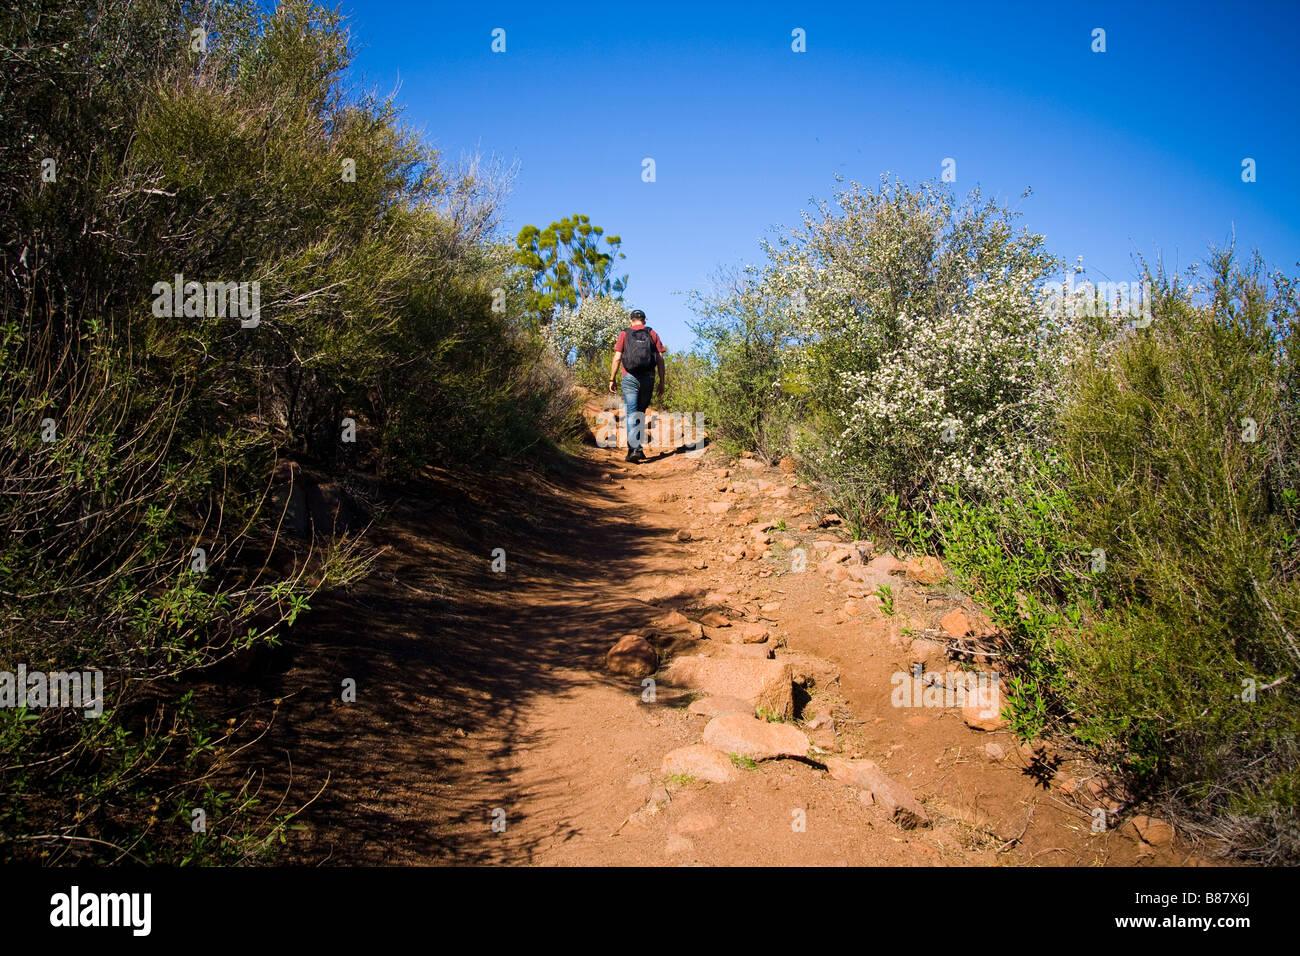 Hiker on the mishe mokwa and backbone trail Santa Monica mountains hiking - Stock Image